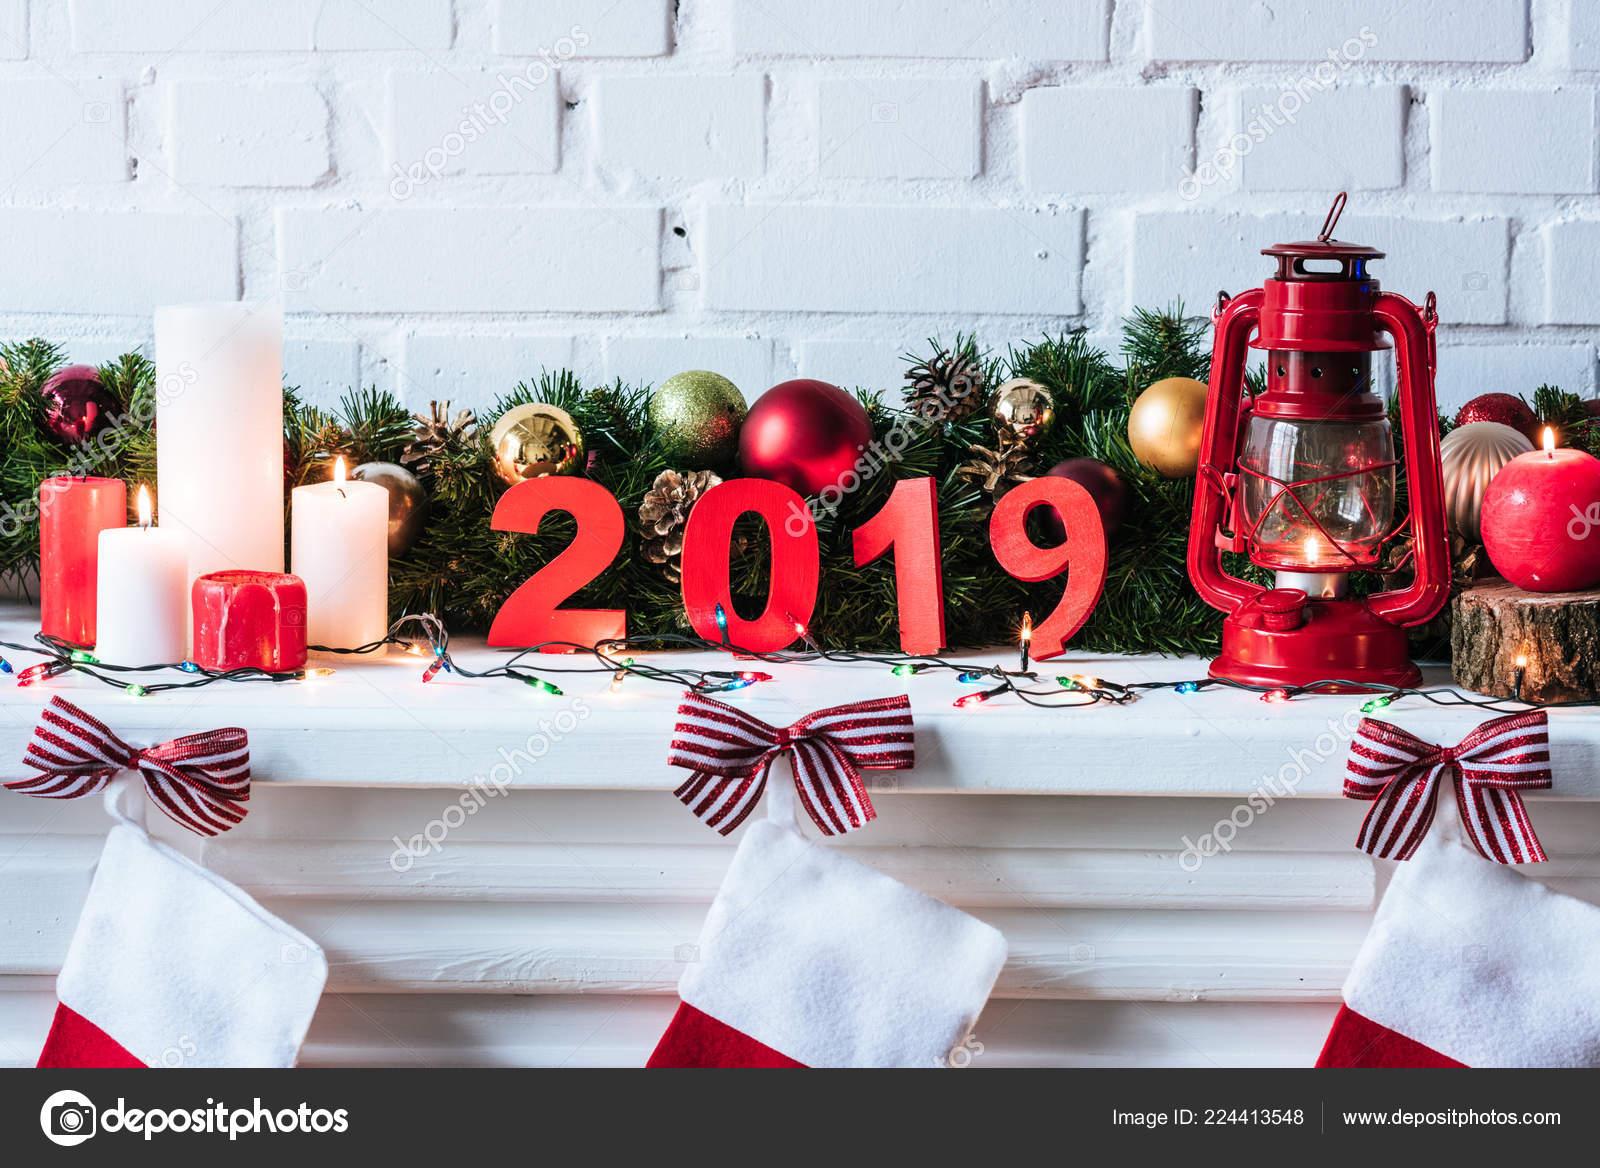 ann e 2019 signer avec guirlande no l bougies chaussettes photographie kostyaklimenko 224413548